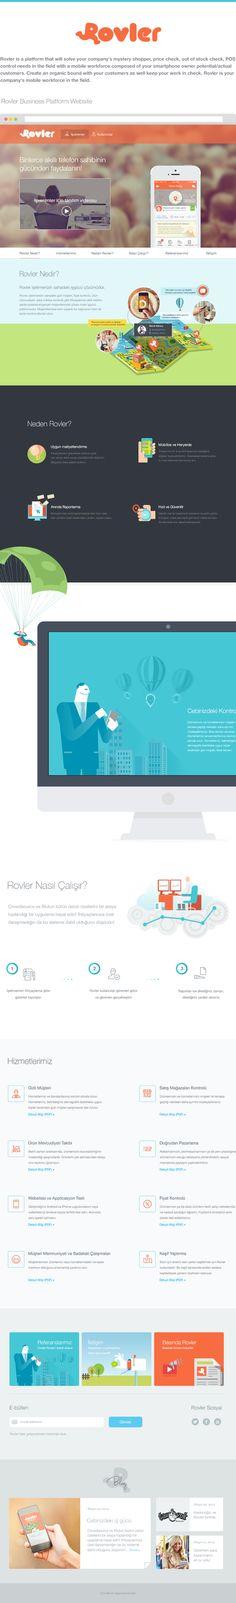 Rovler Website by Murat Gürsoy, via Behance